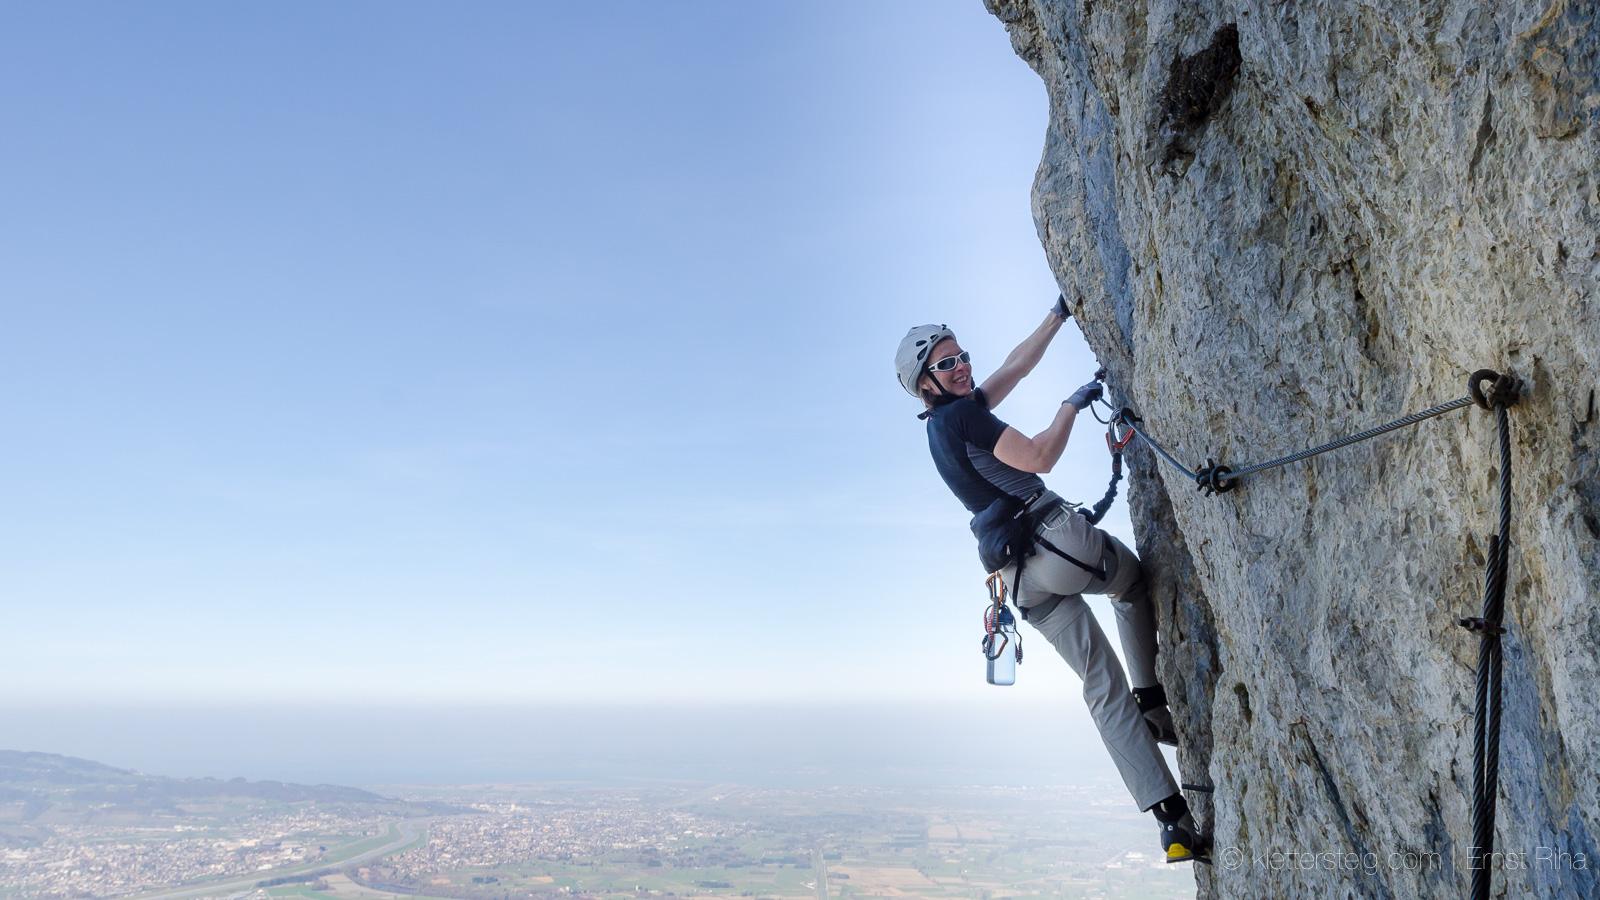 Klettersteig Via Kapf : Via kapf und kessi in götzis vorarlberg klettersteige